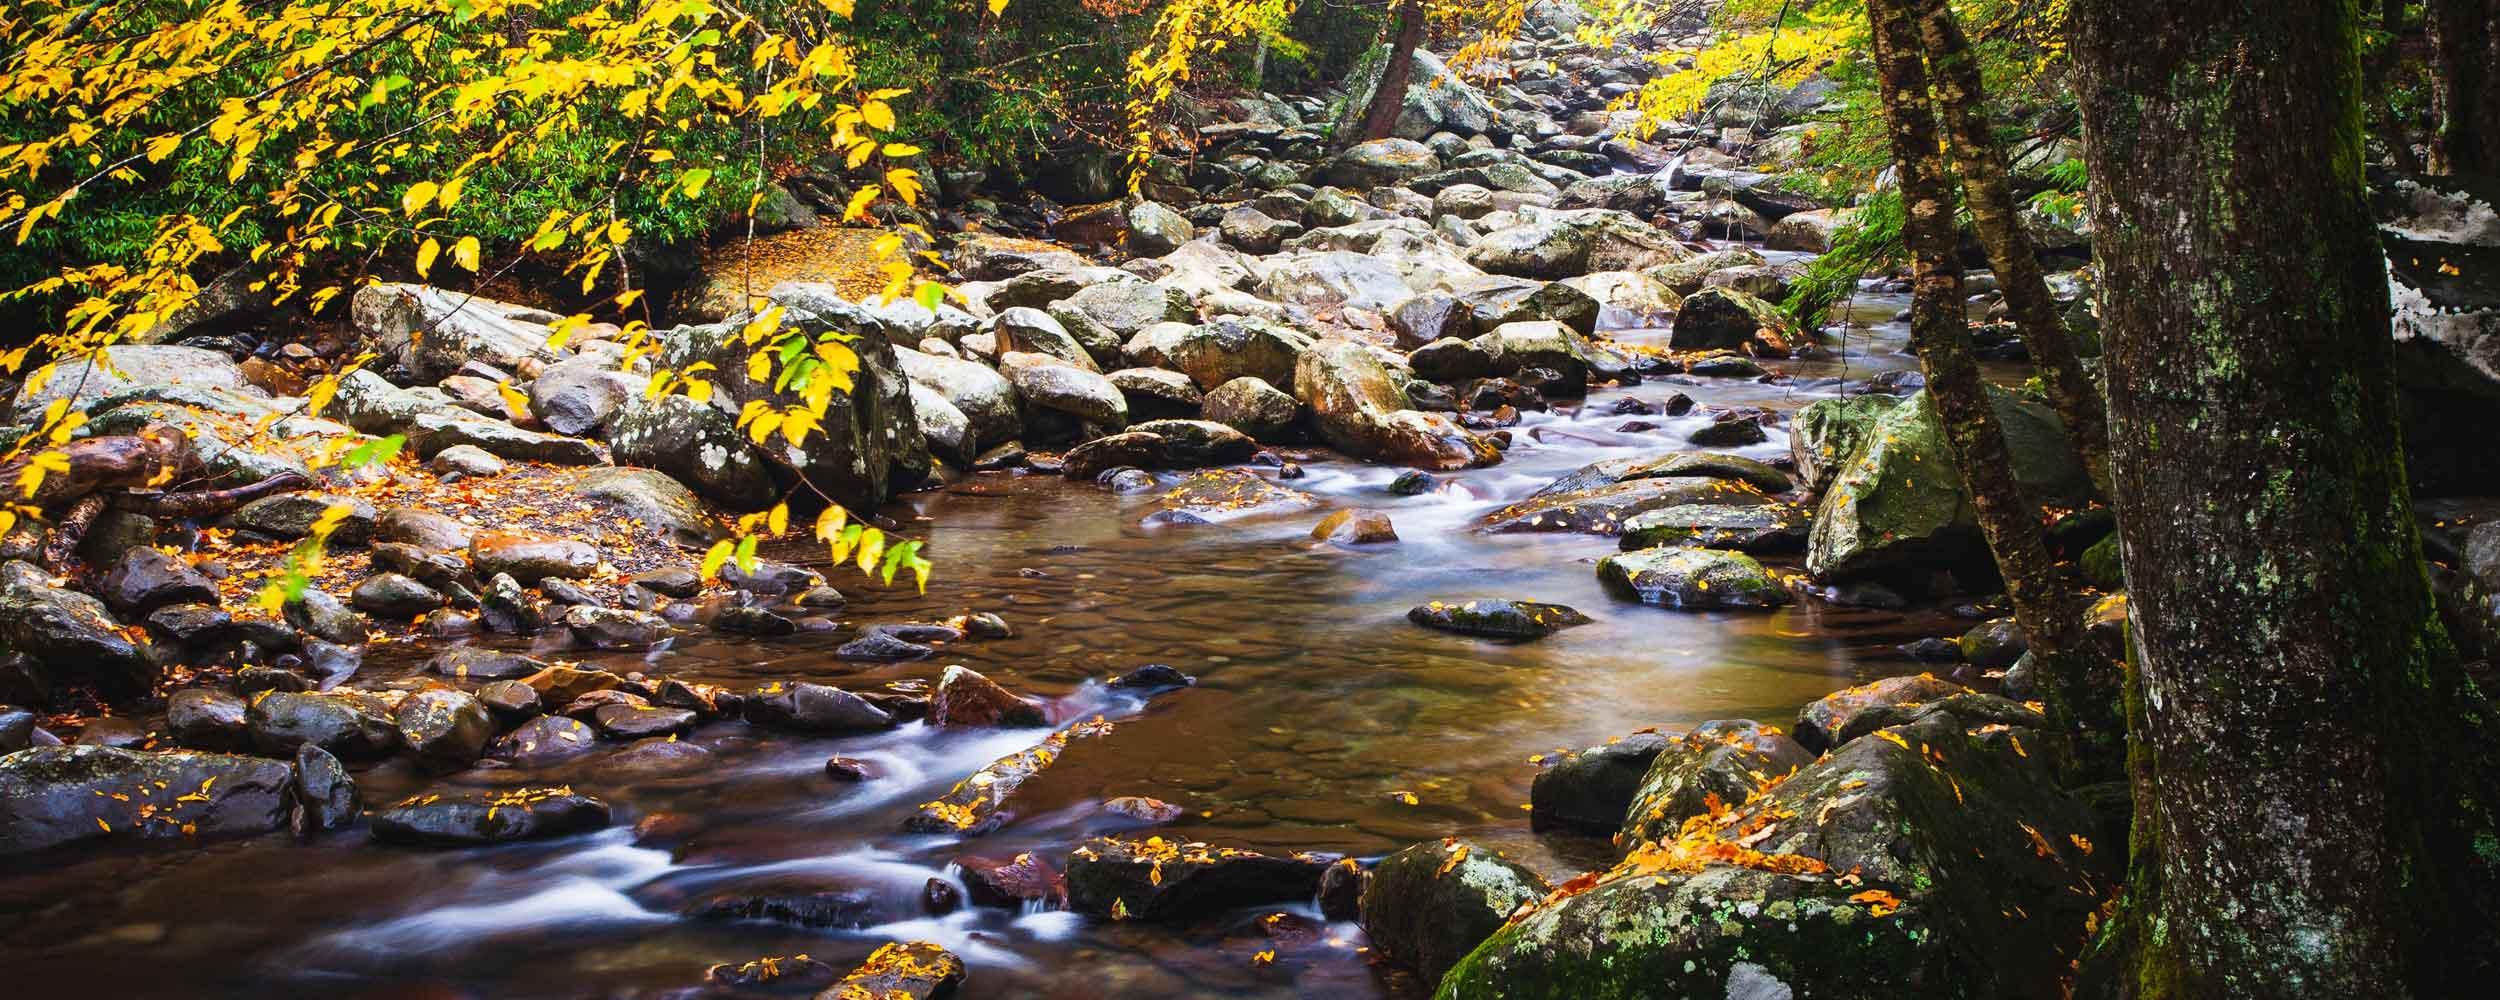 - Stream Restoration